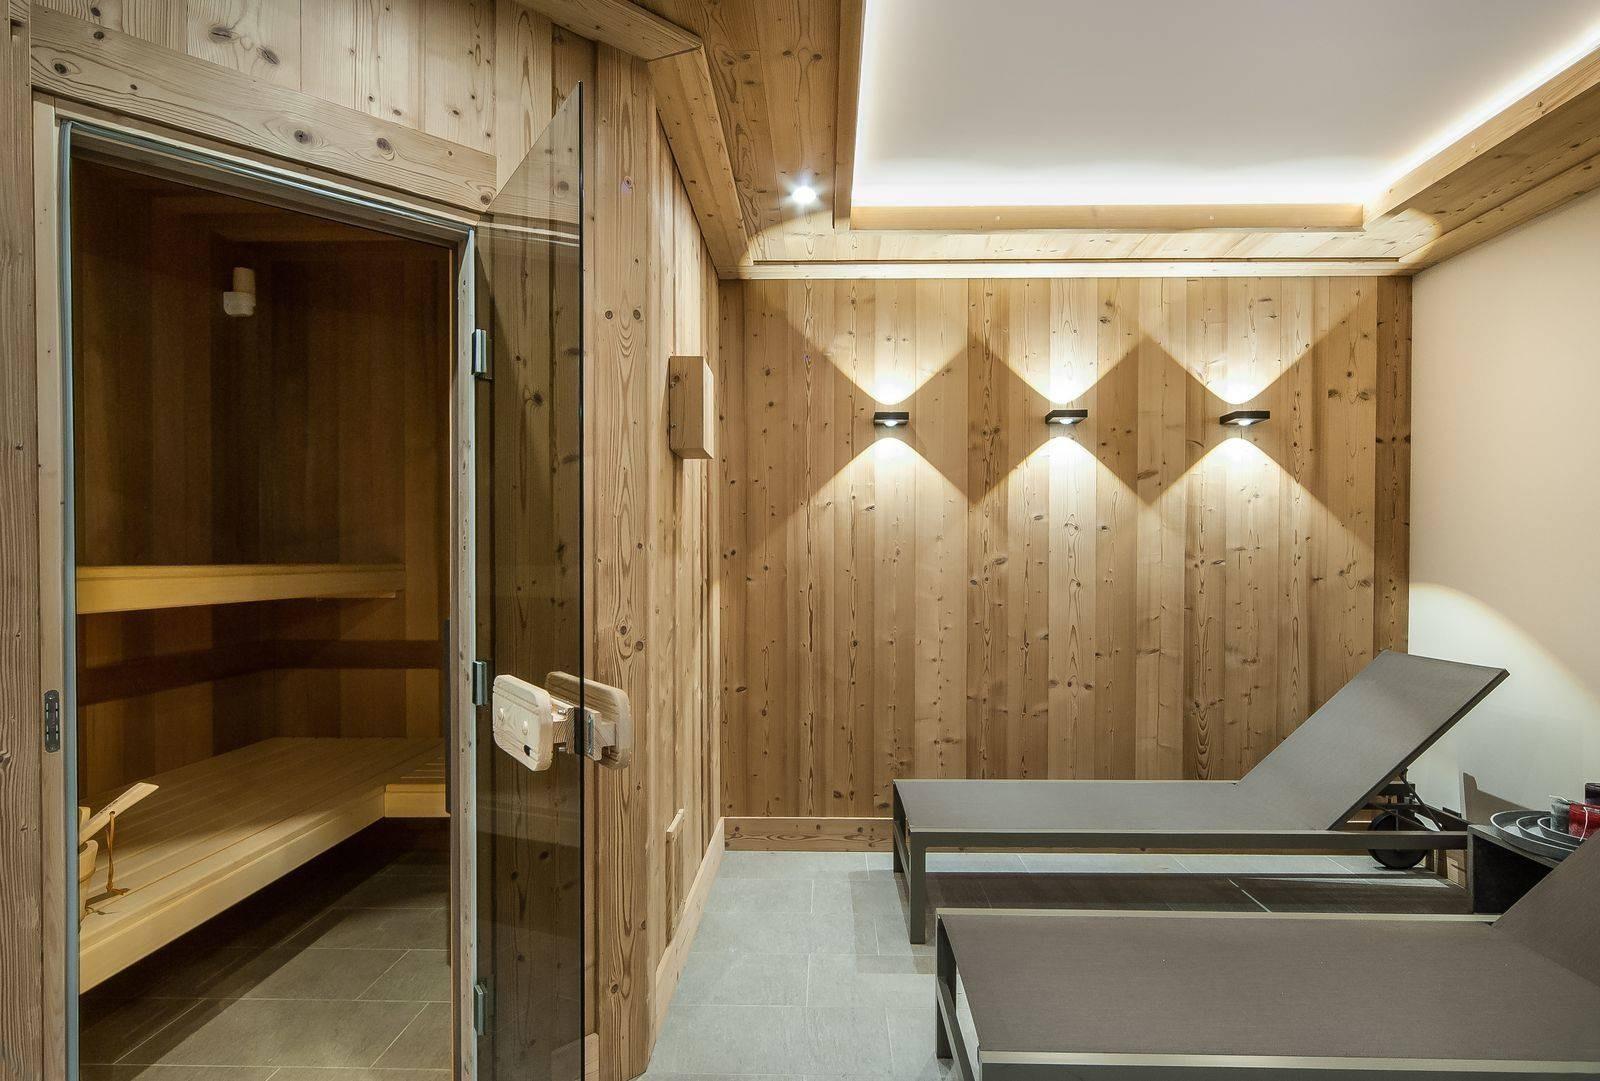 Courchevel 1550 Location Chalet Luxe Niurer Sauna